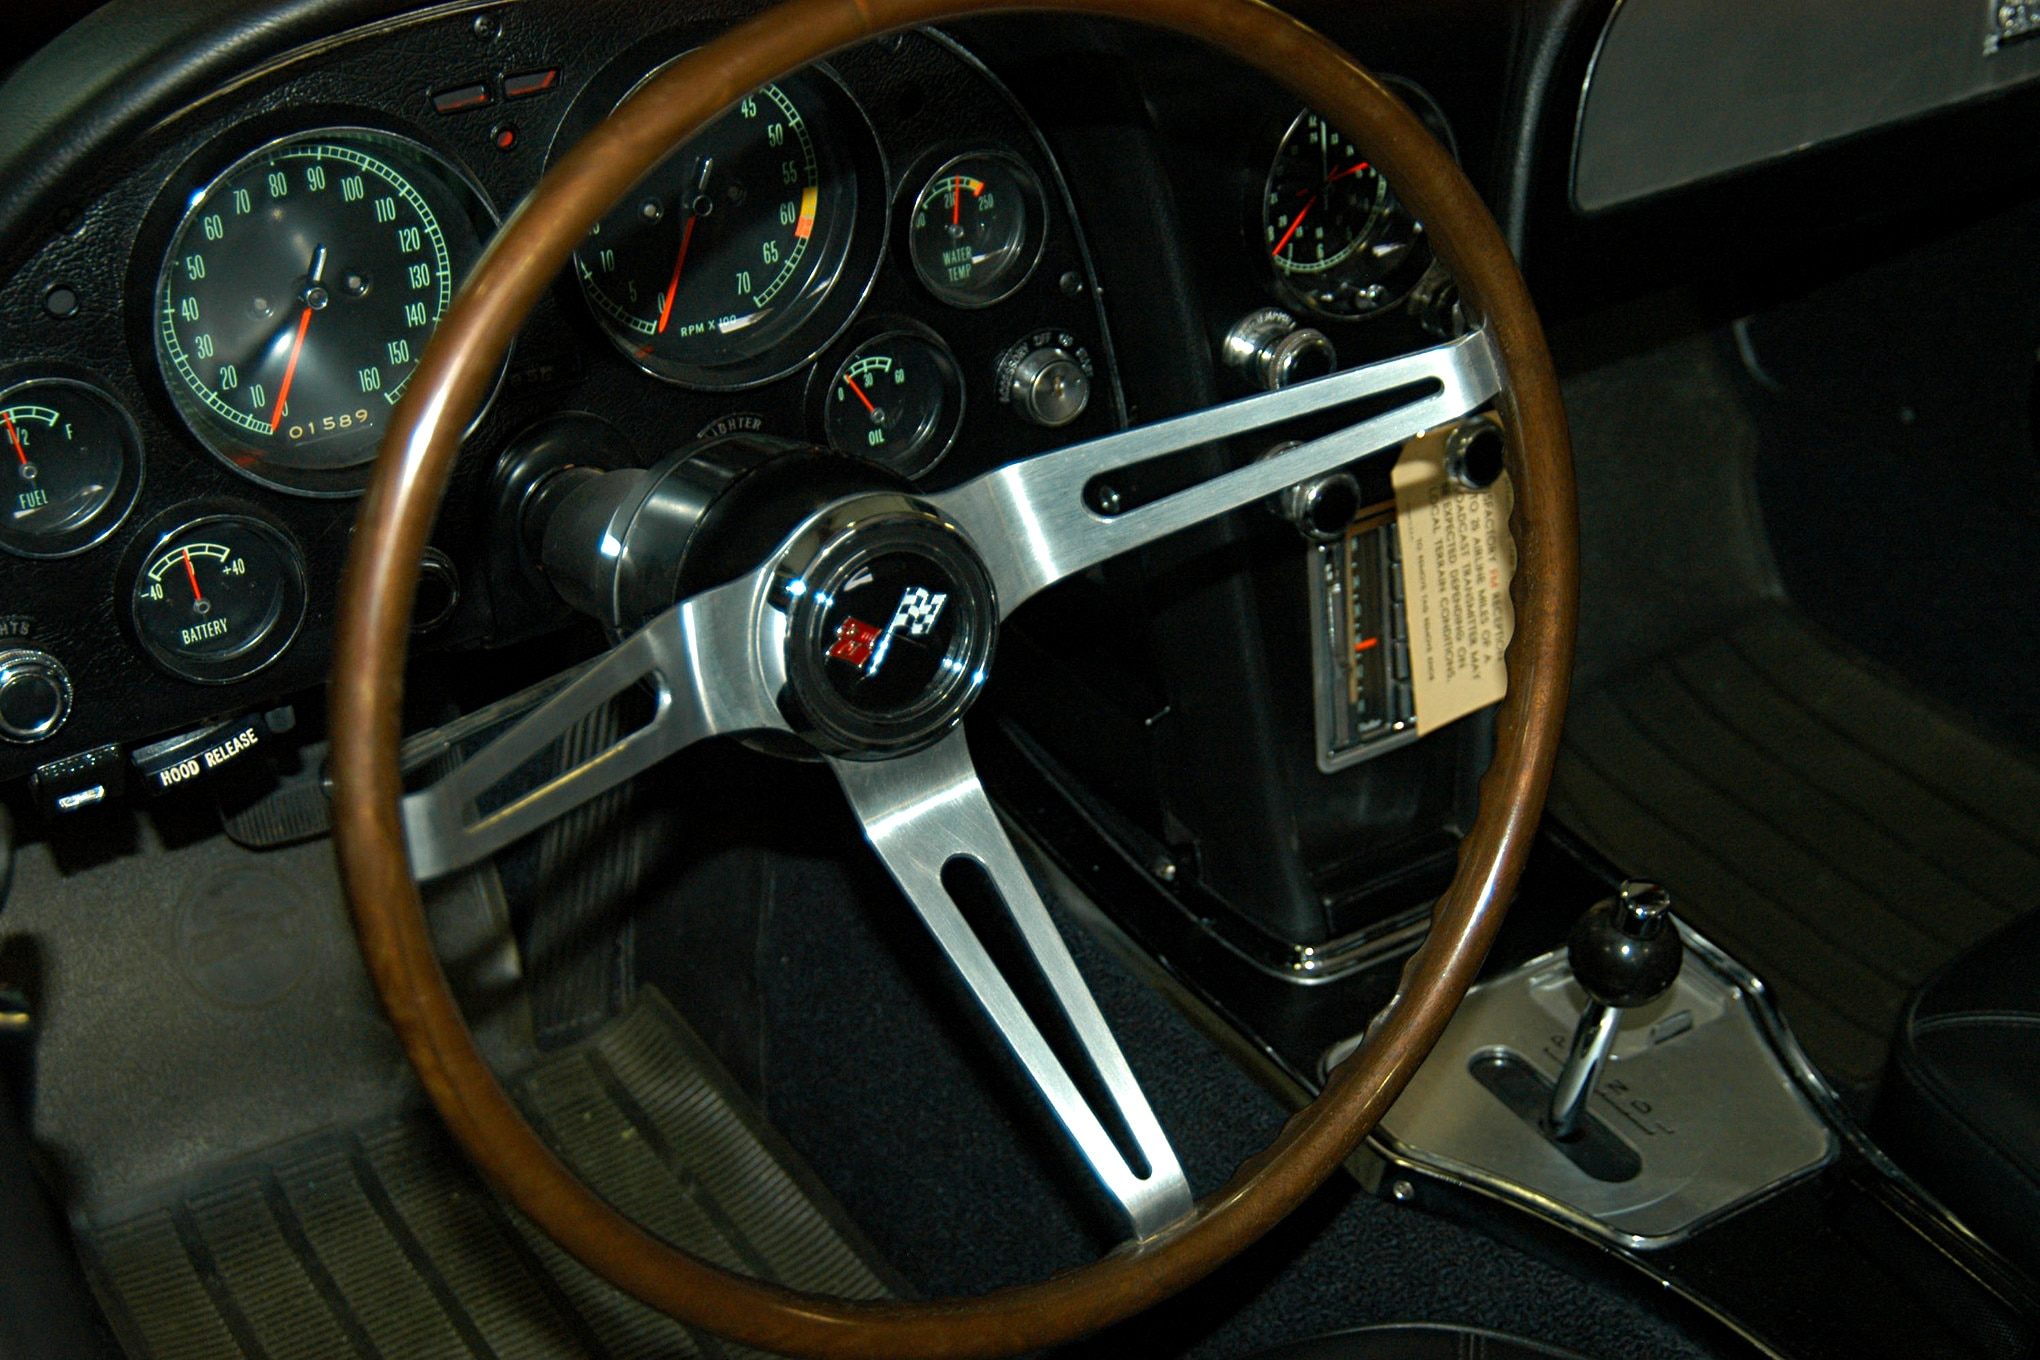 1963 to 1982 corvette horn button repair, part 2Also 1963 Corvette Steering Column Diagram On Corvette Tach Wiring #1